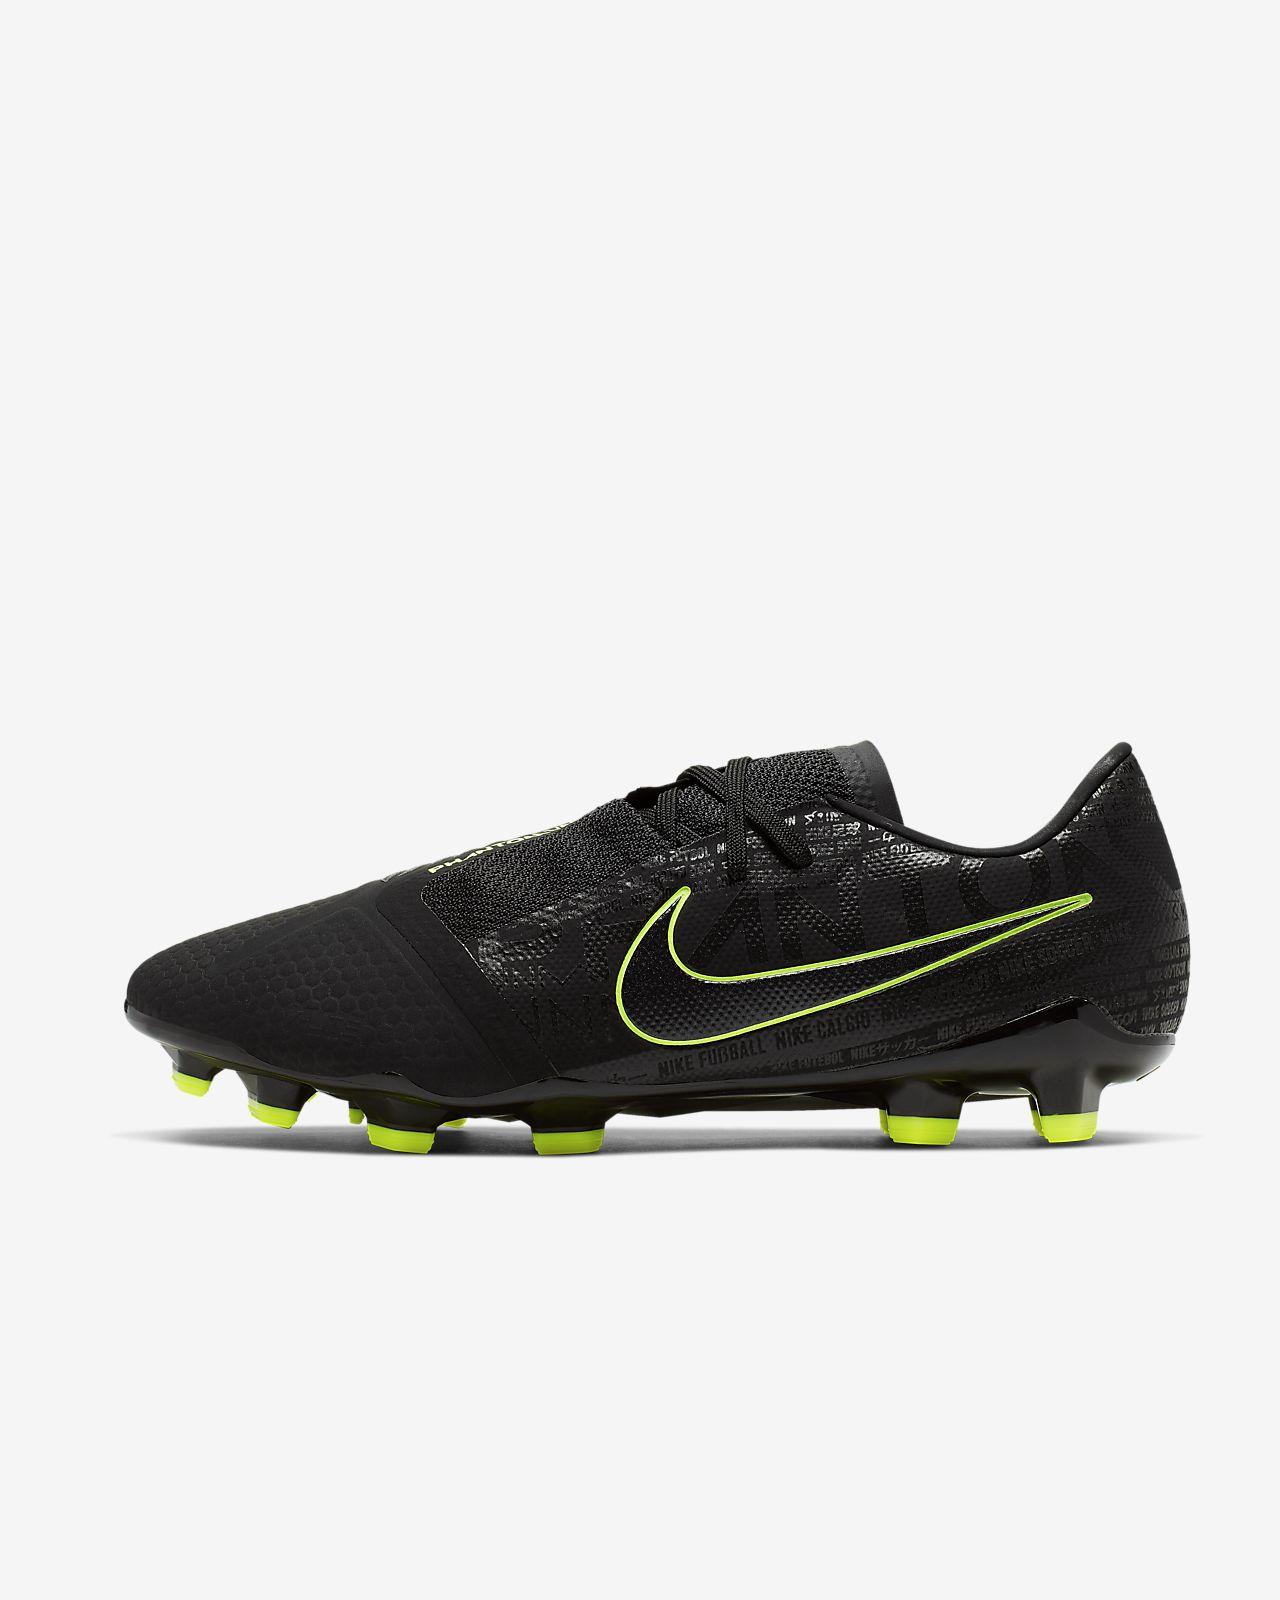 Nike Phantom Venom Pro FG Firm-Ground Soccer Cleat